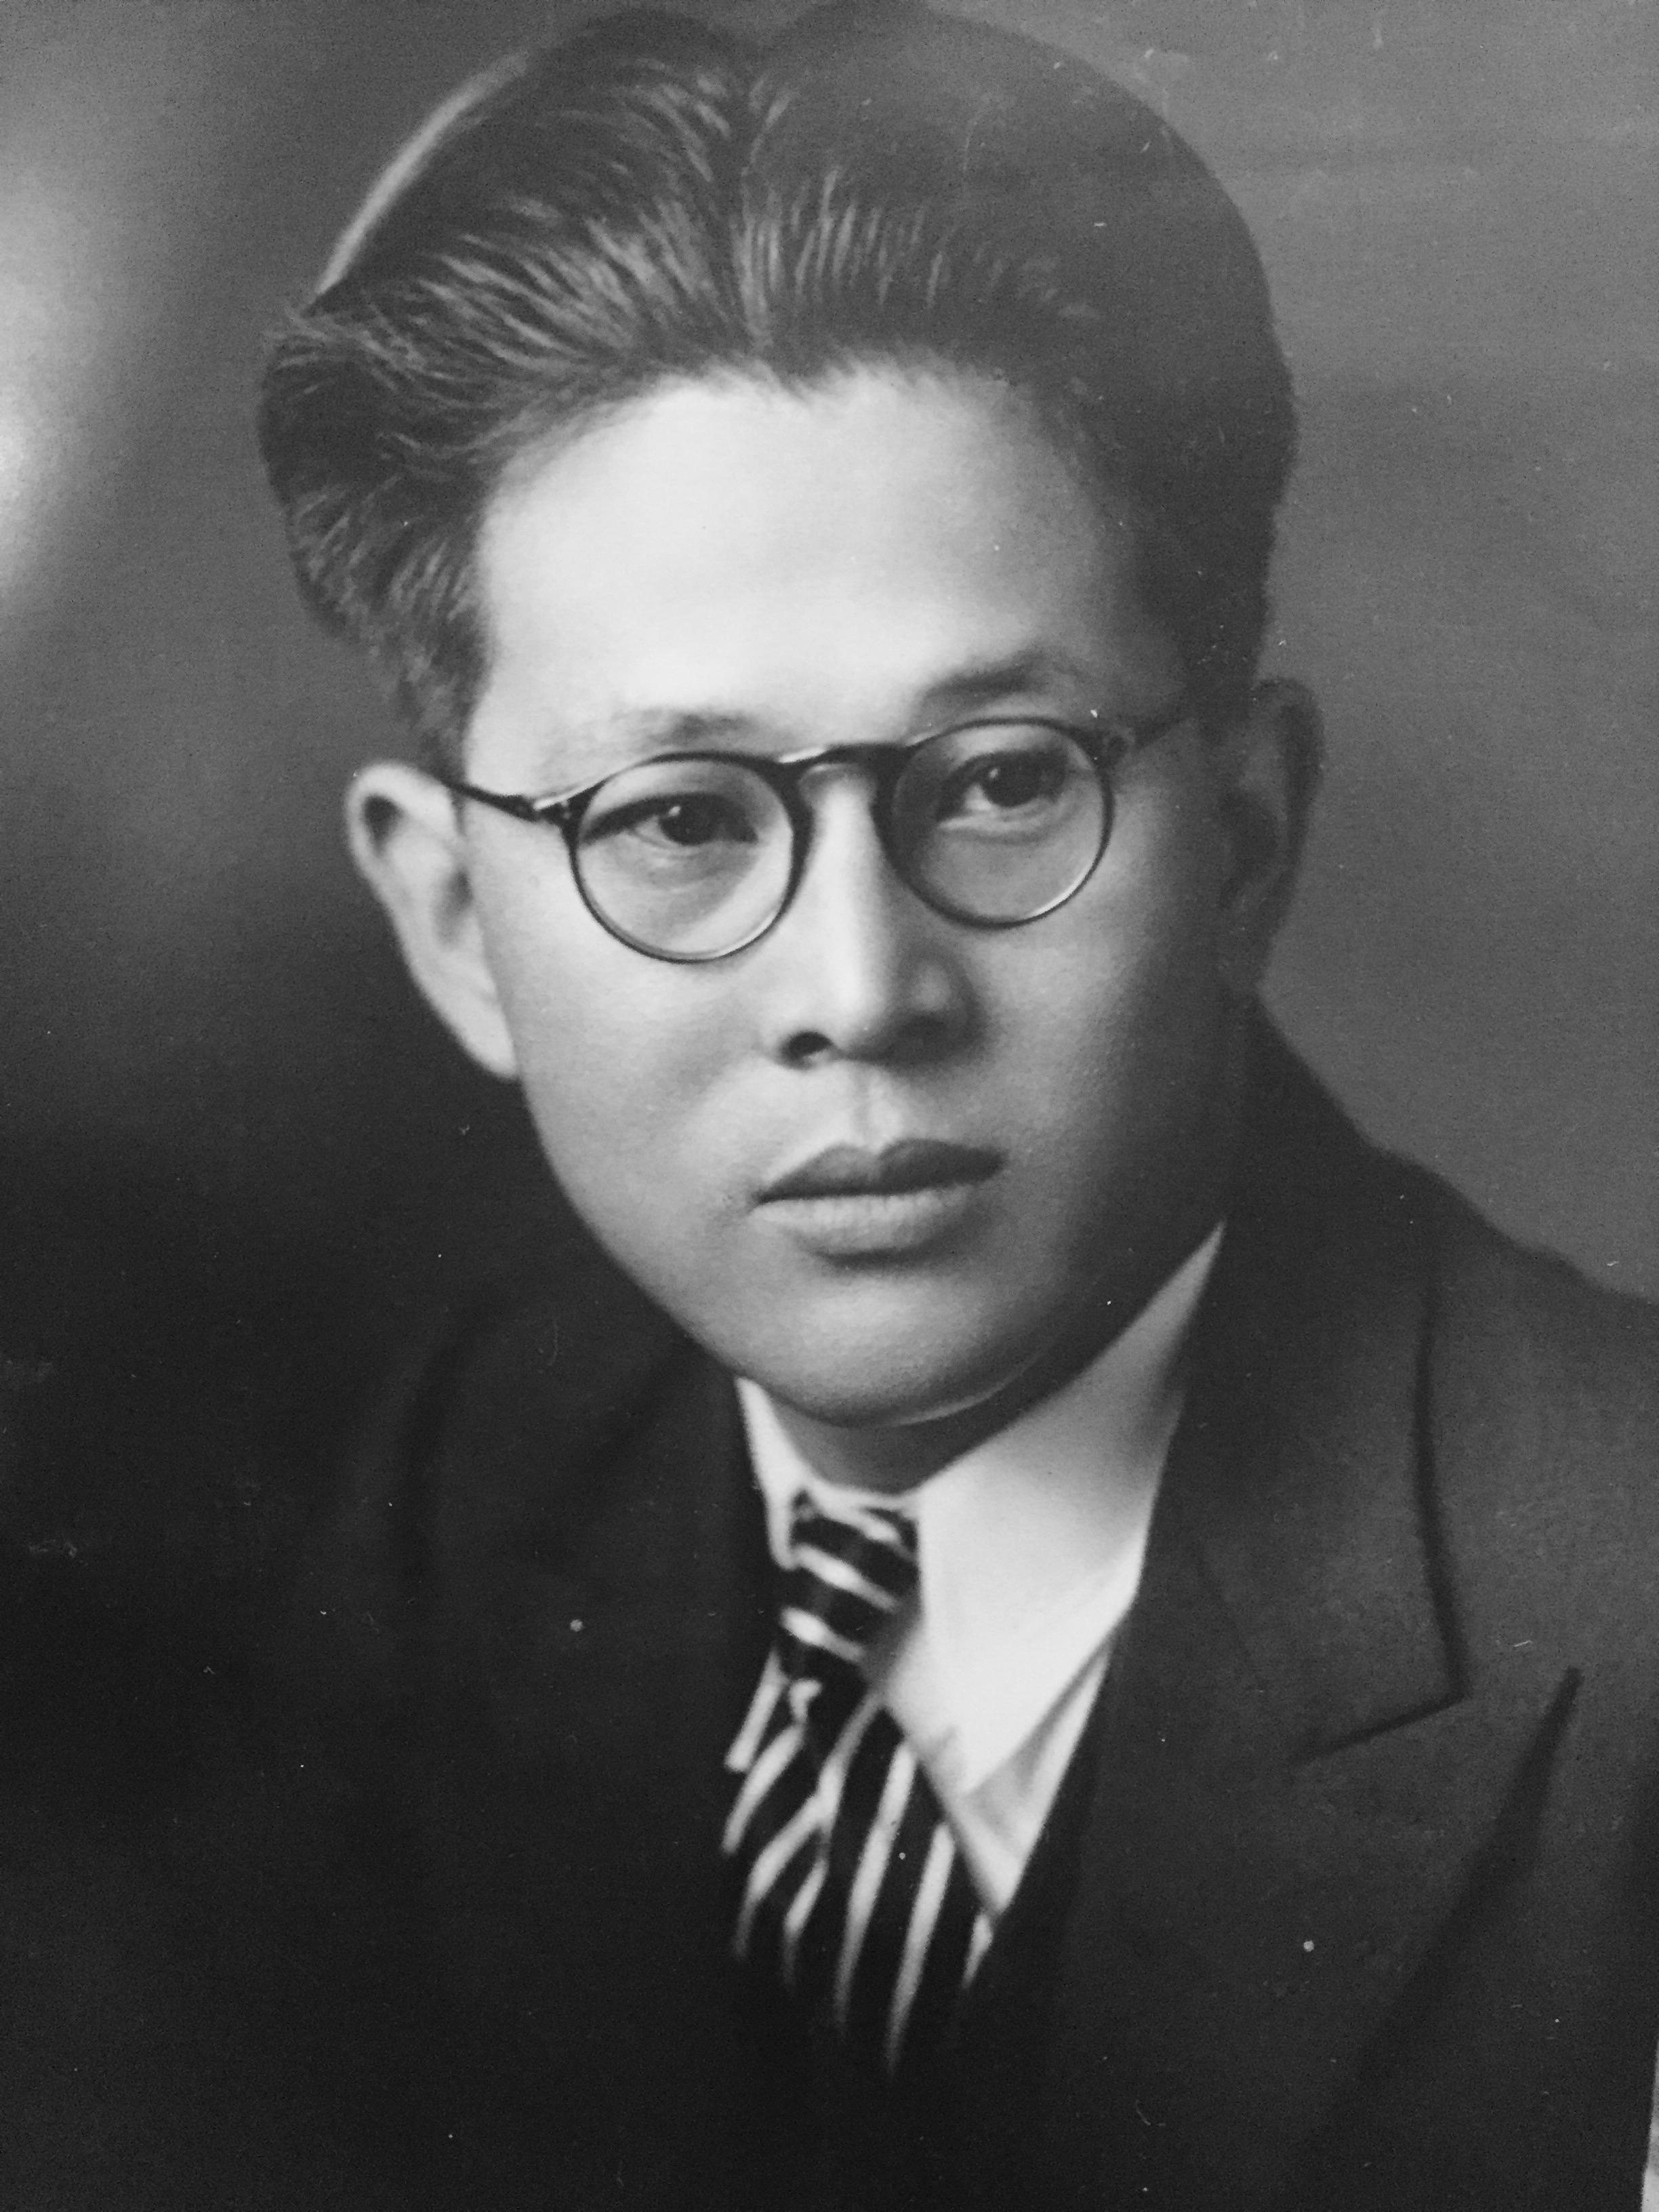 Howard's father, Masaru Yamamoto